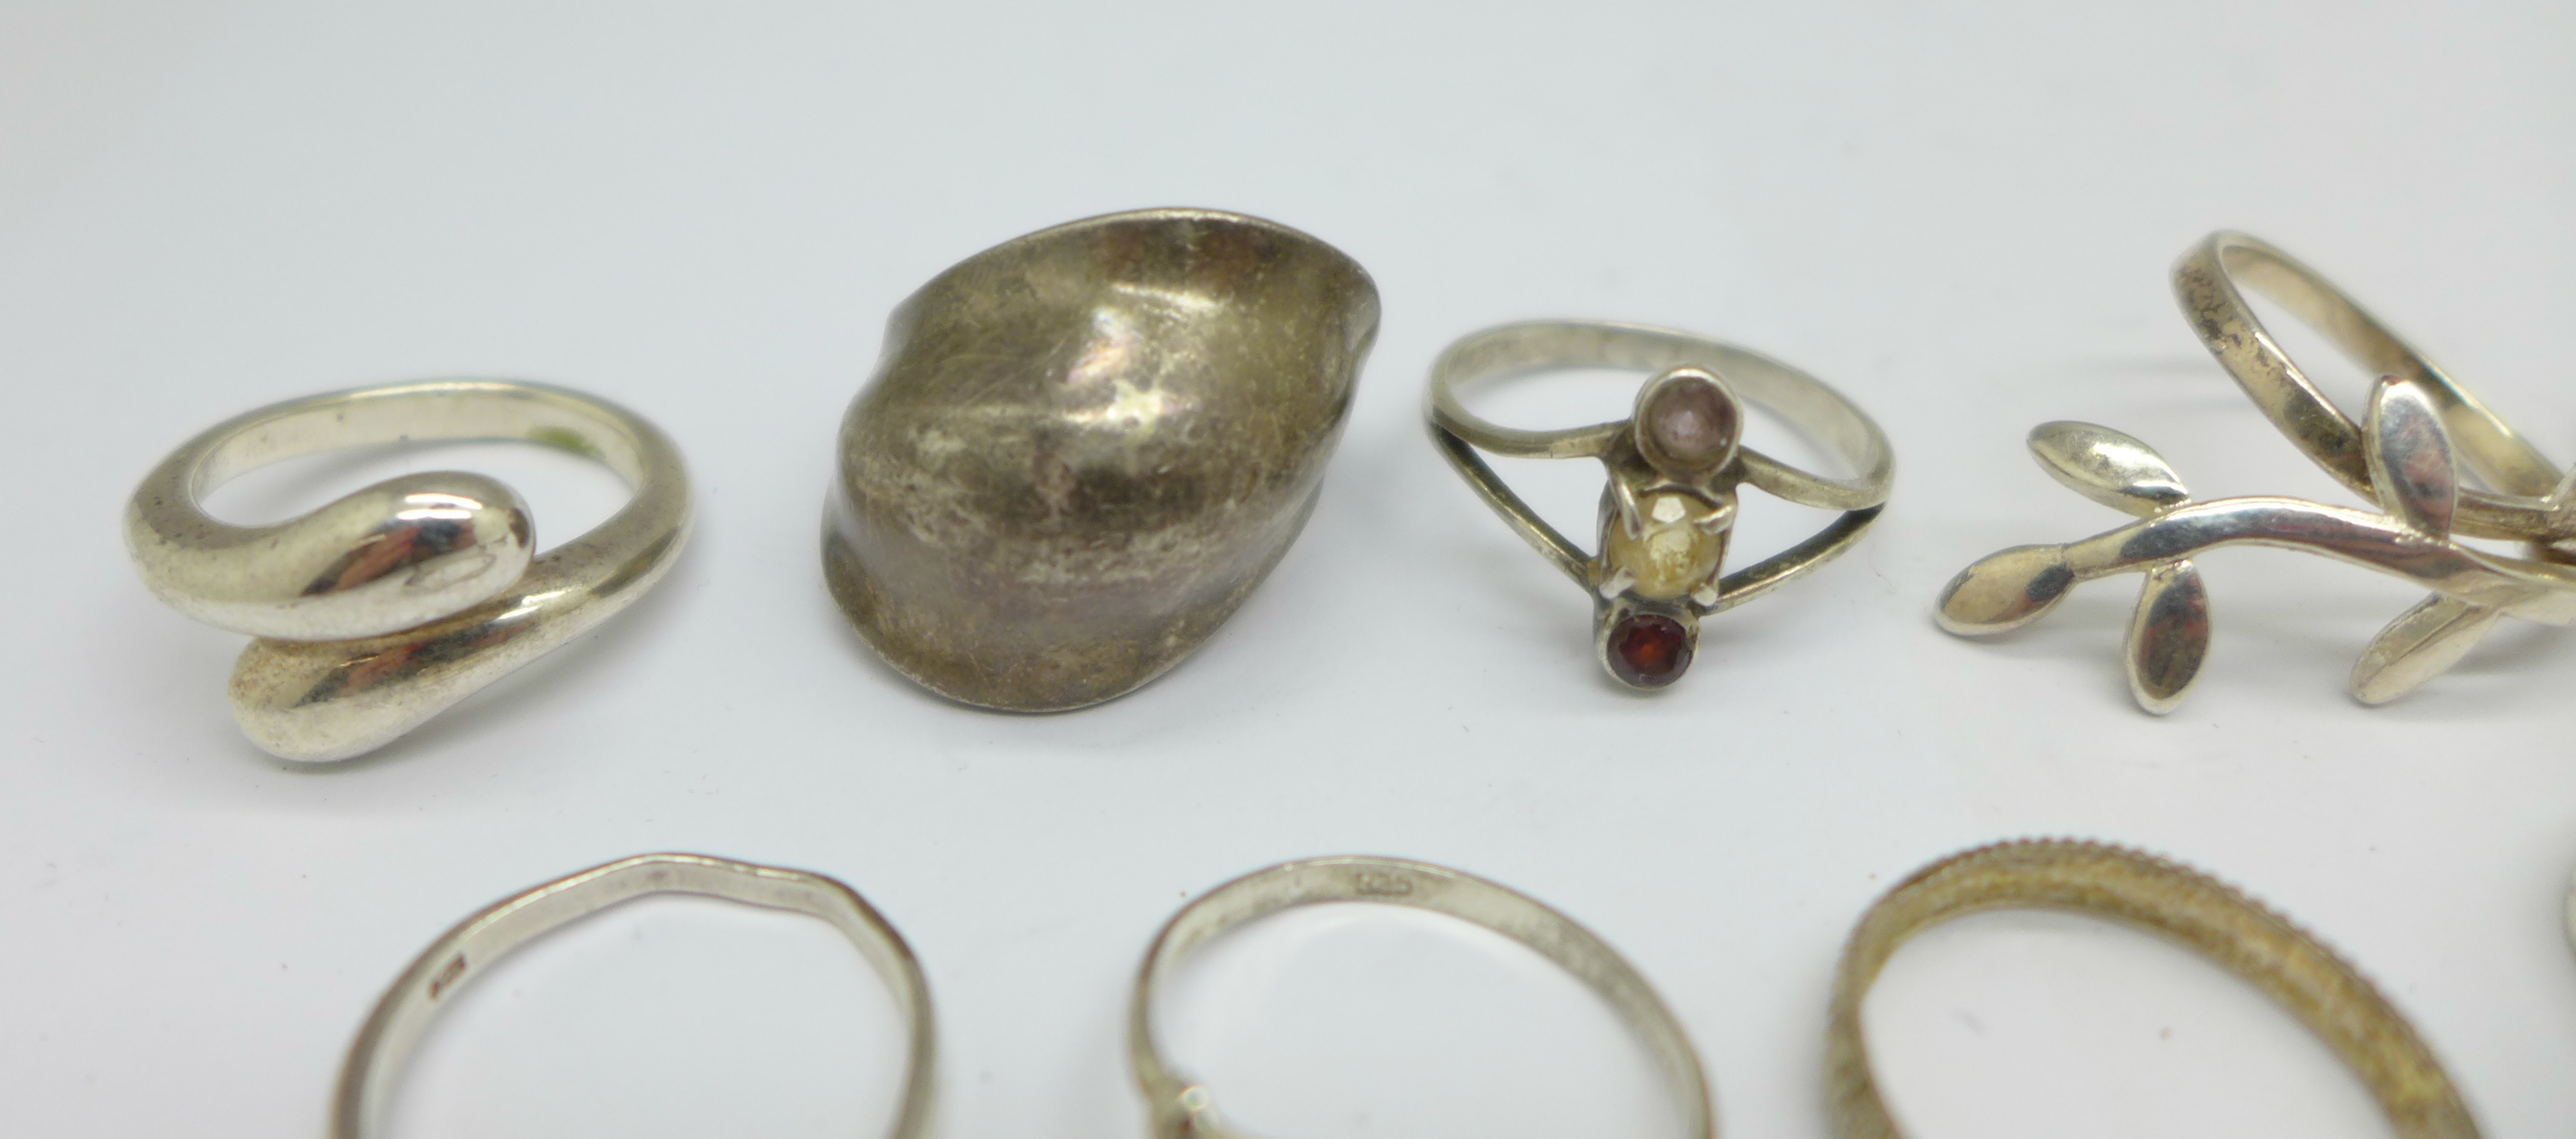 Ten silver rings, 28g - Image 4 of 5